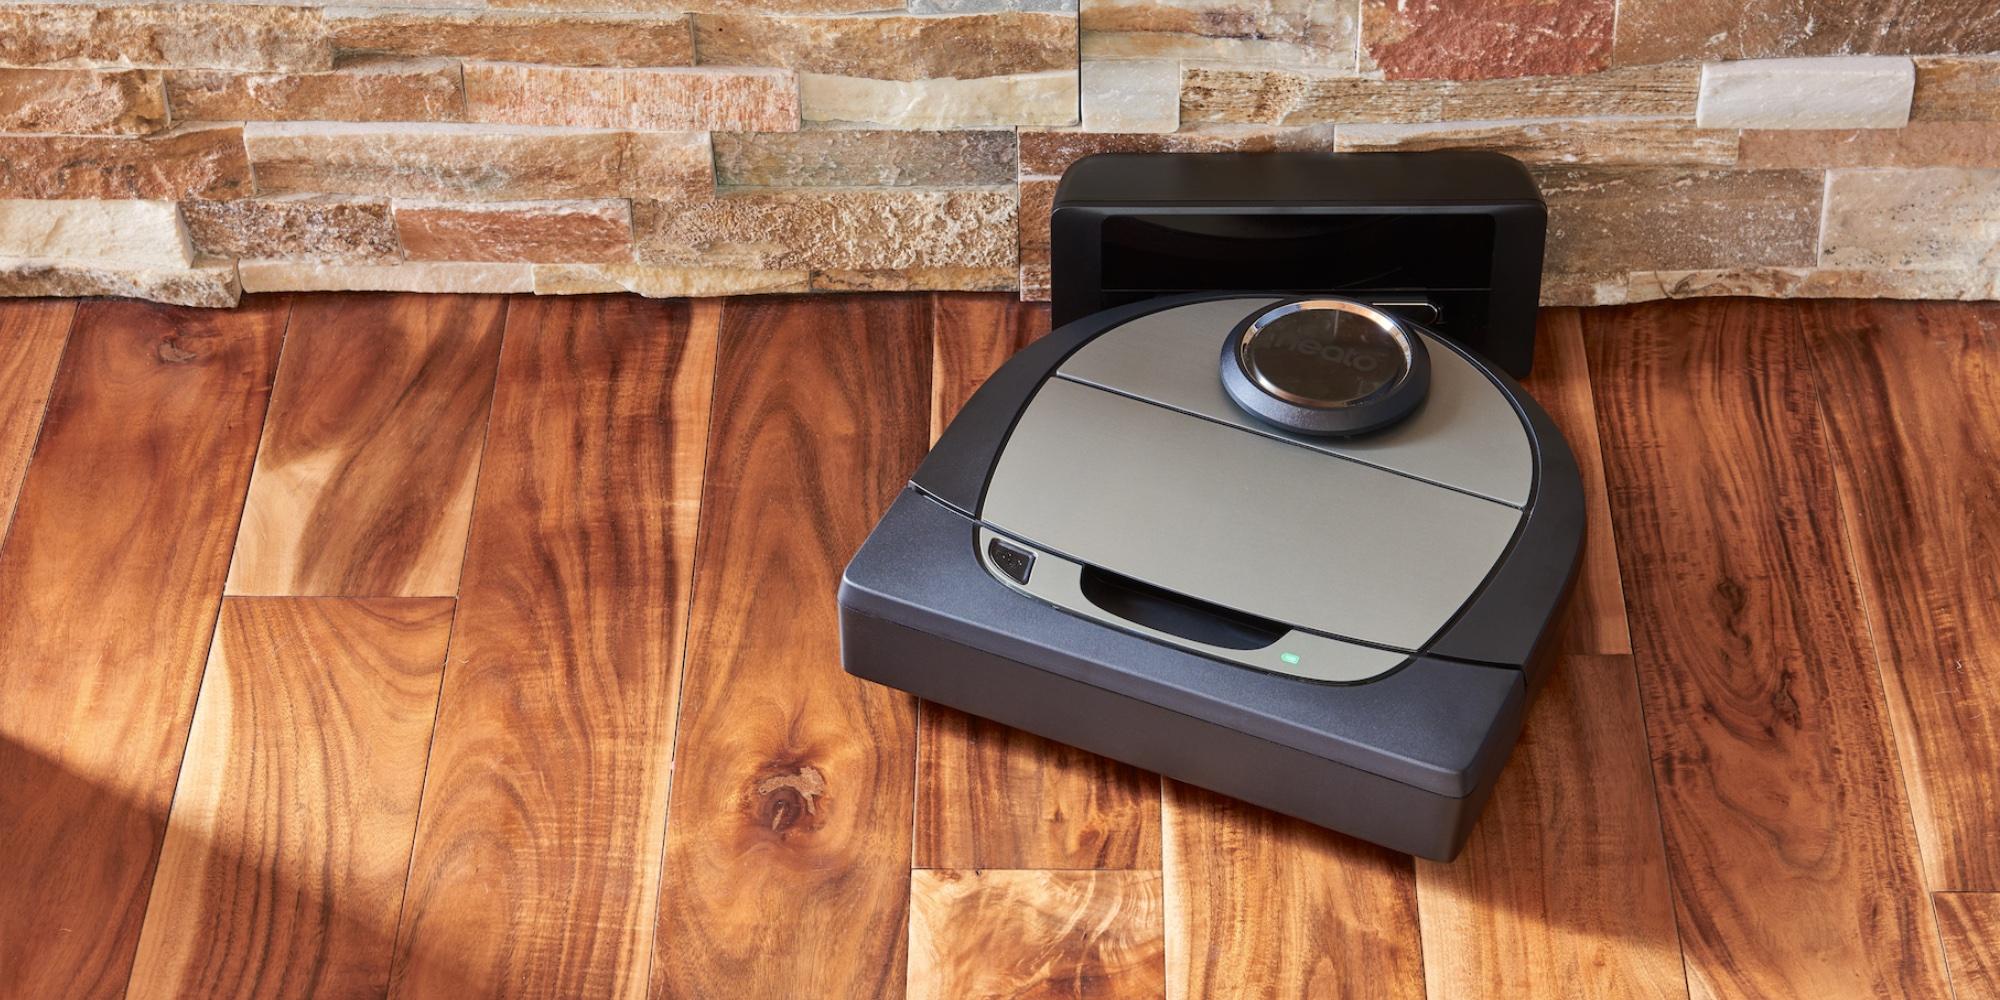 Robotic Vacuum Black Friday Deals Roomba Neato More